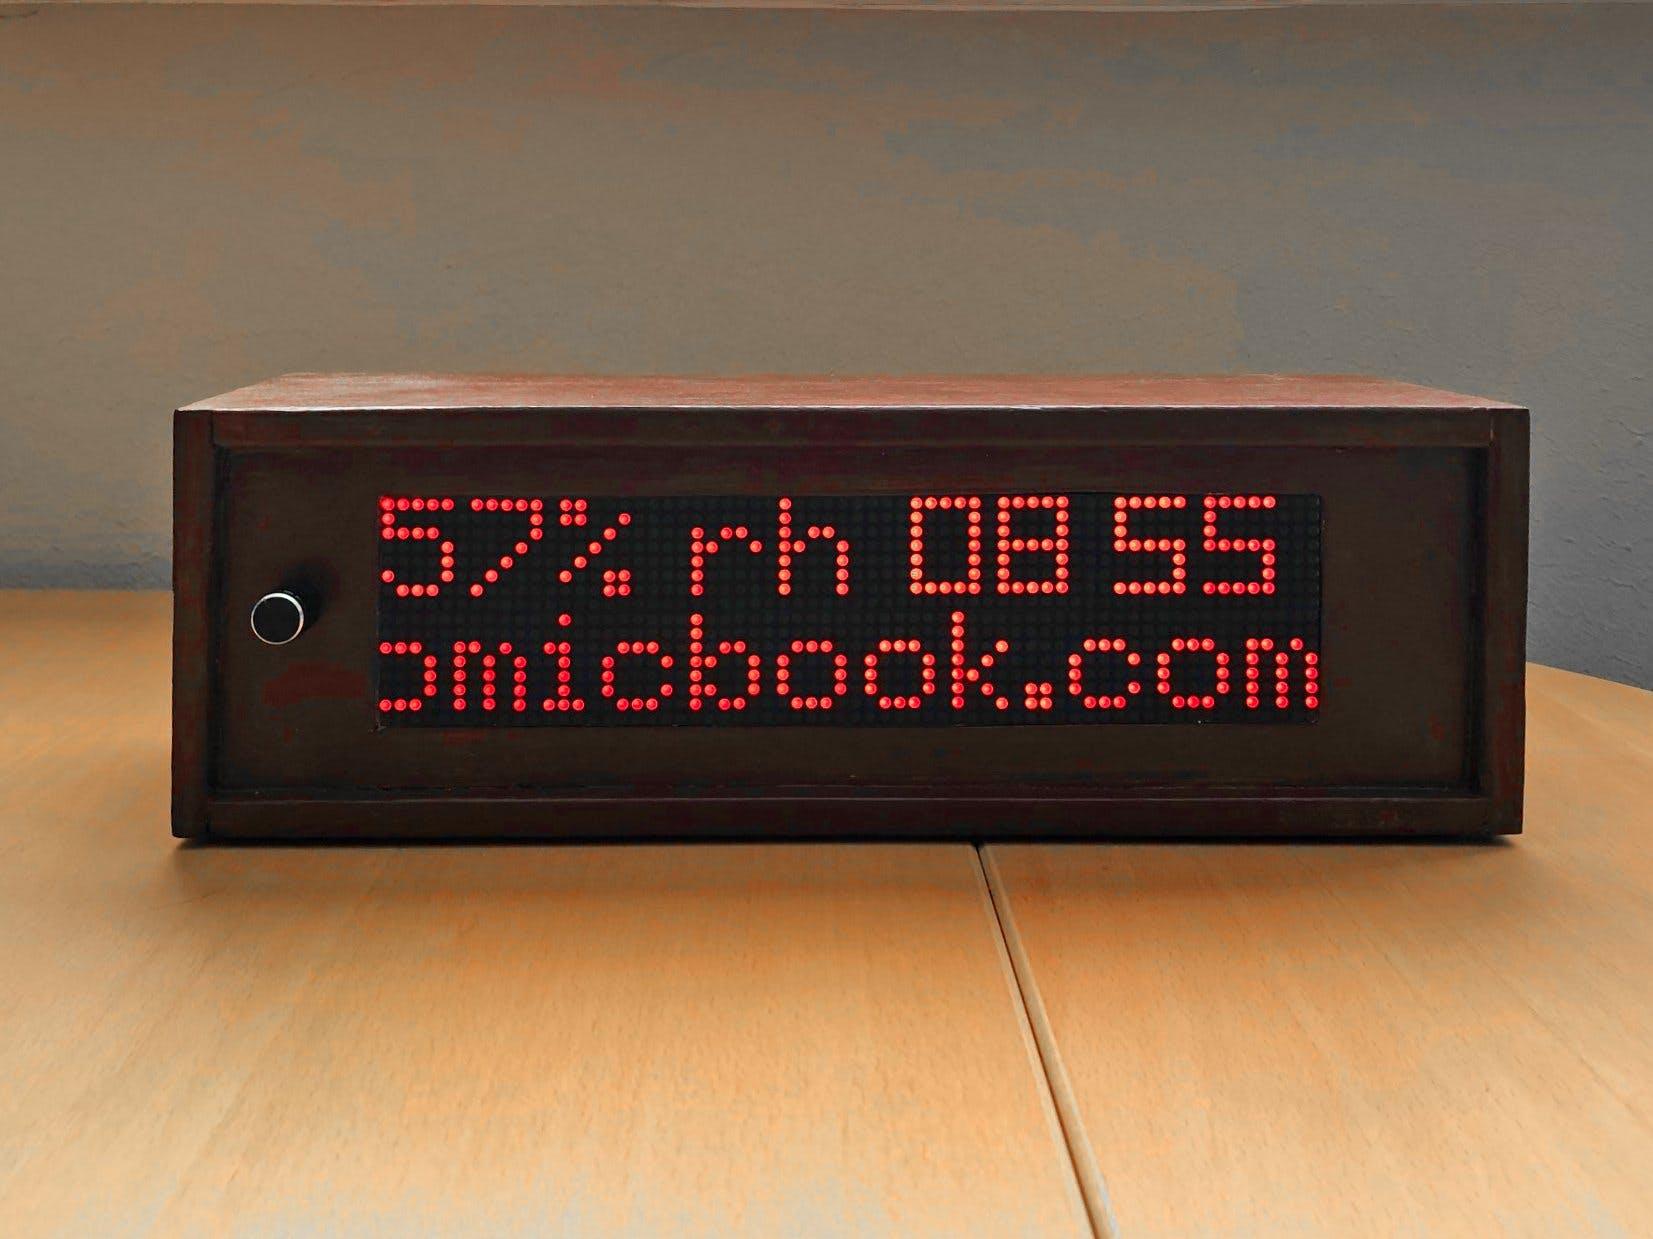 1024 LED Matrix WiFi Message Board with Menu + Web Interface